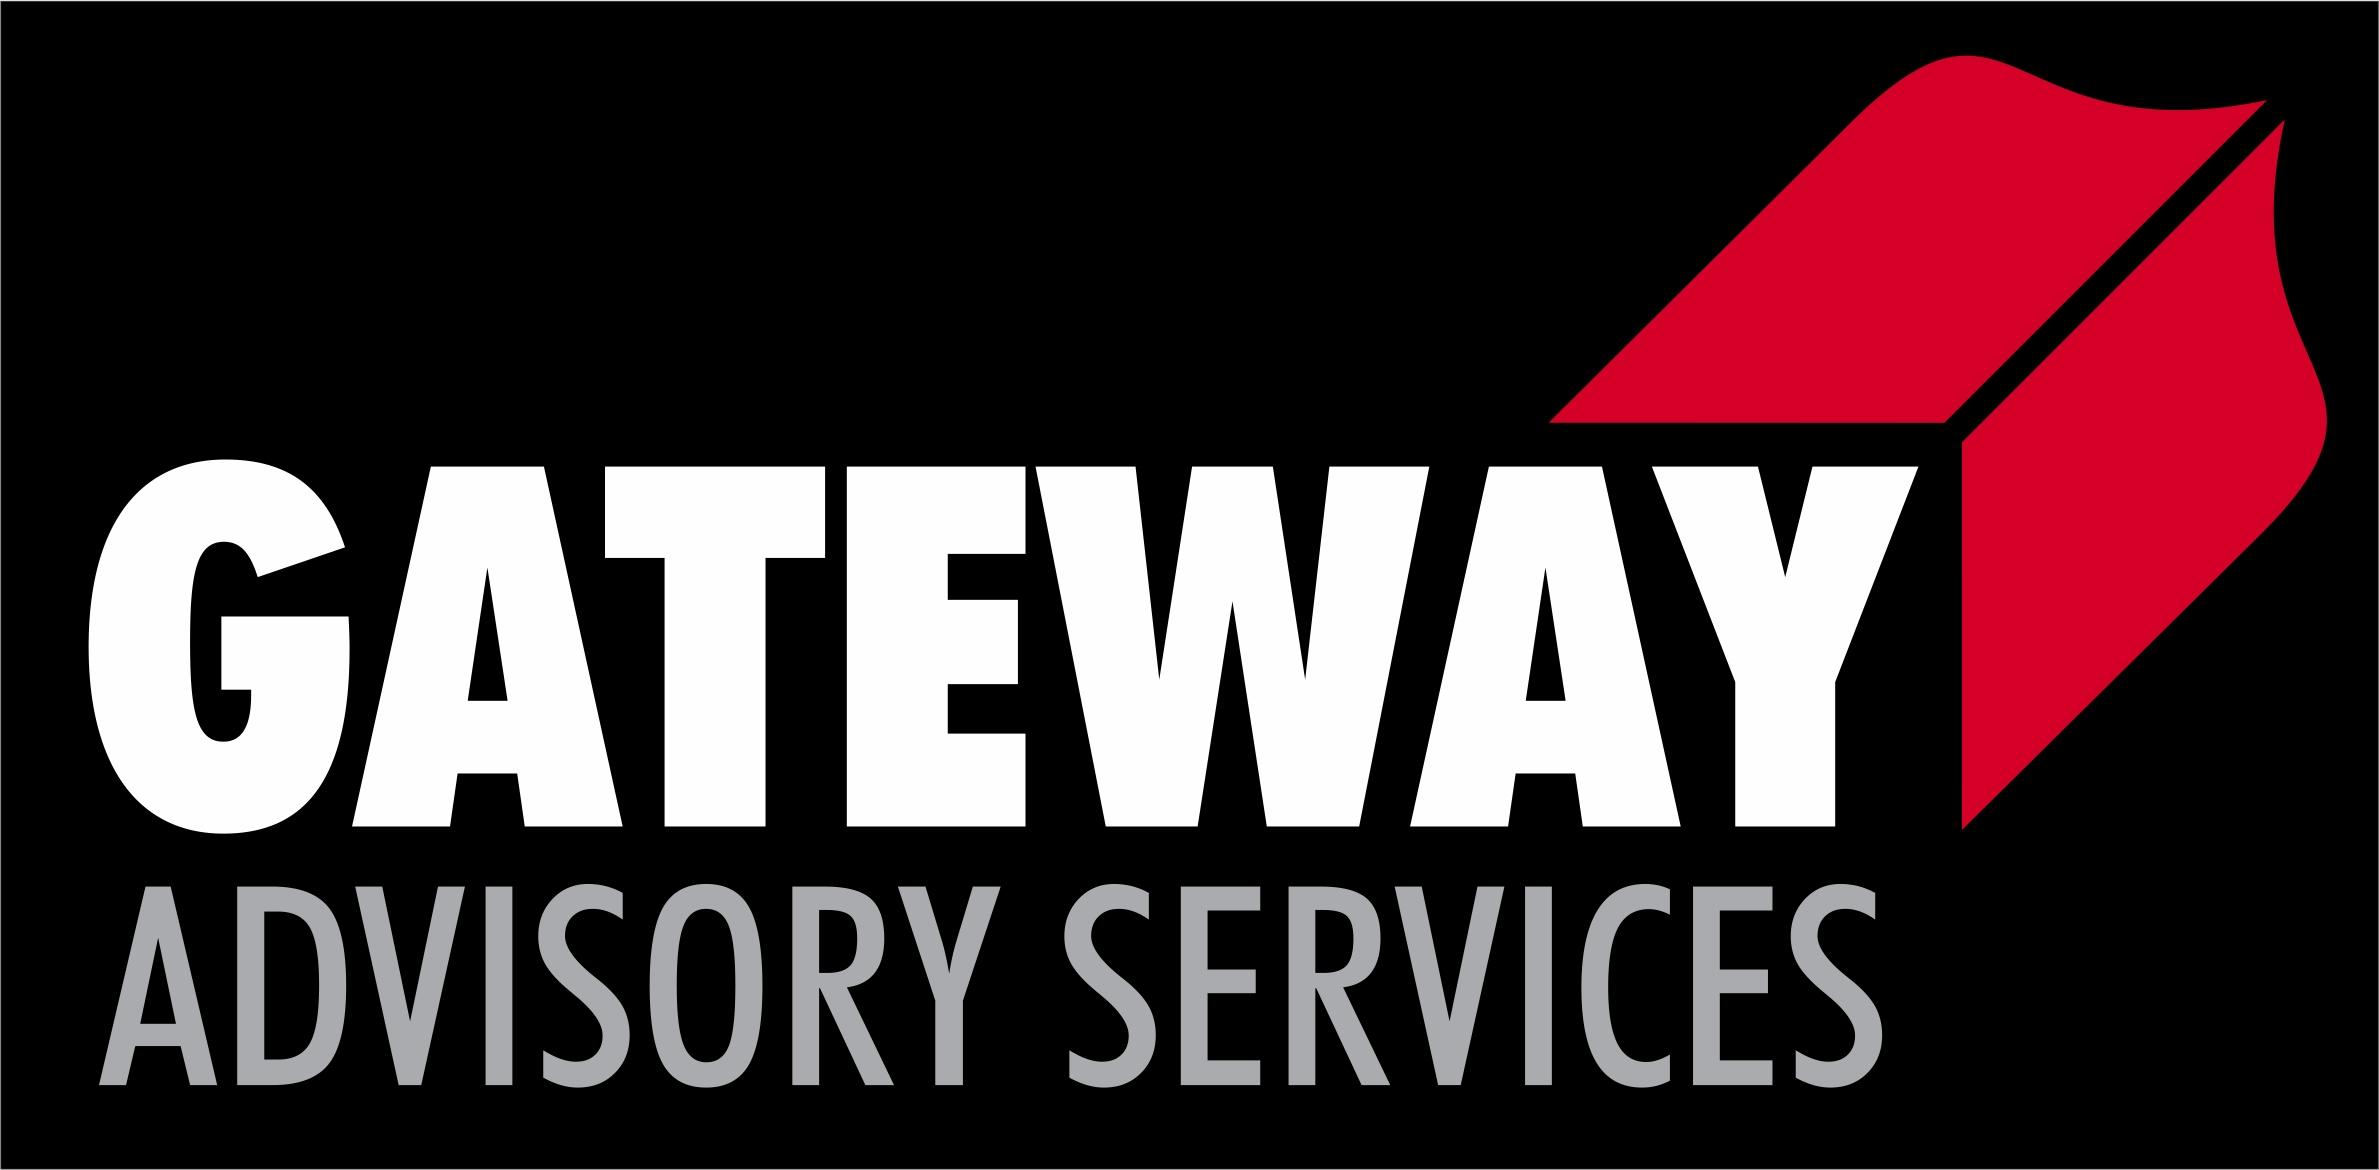 GATEWAY ADVISORY SERVICES (PTY) LTD